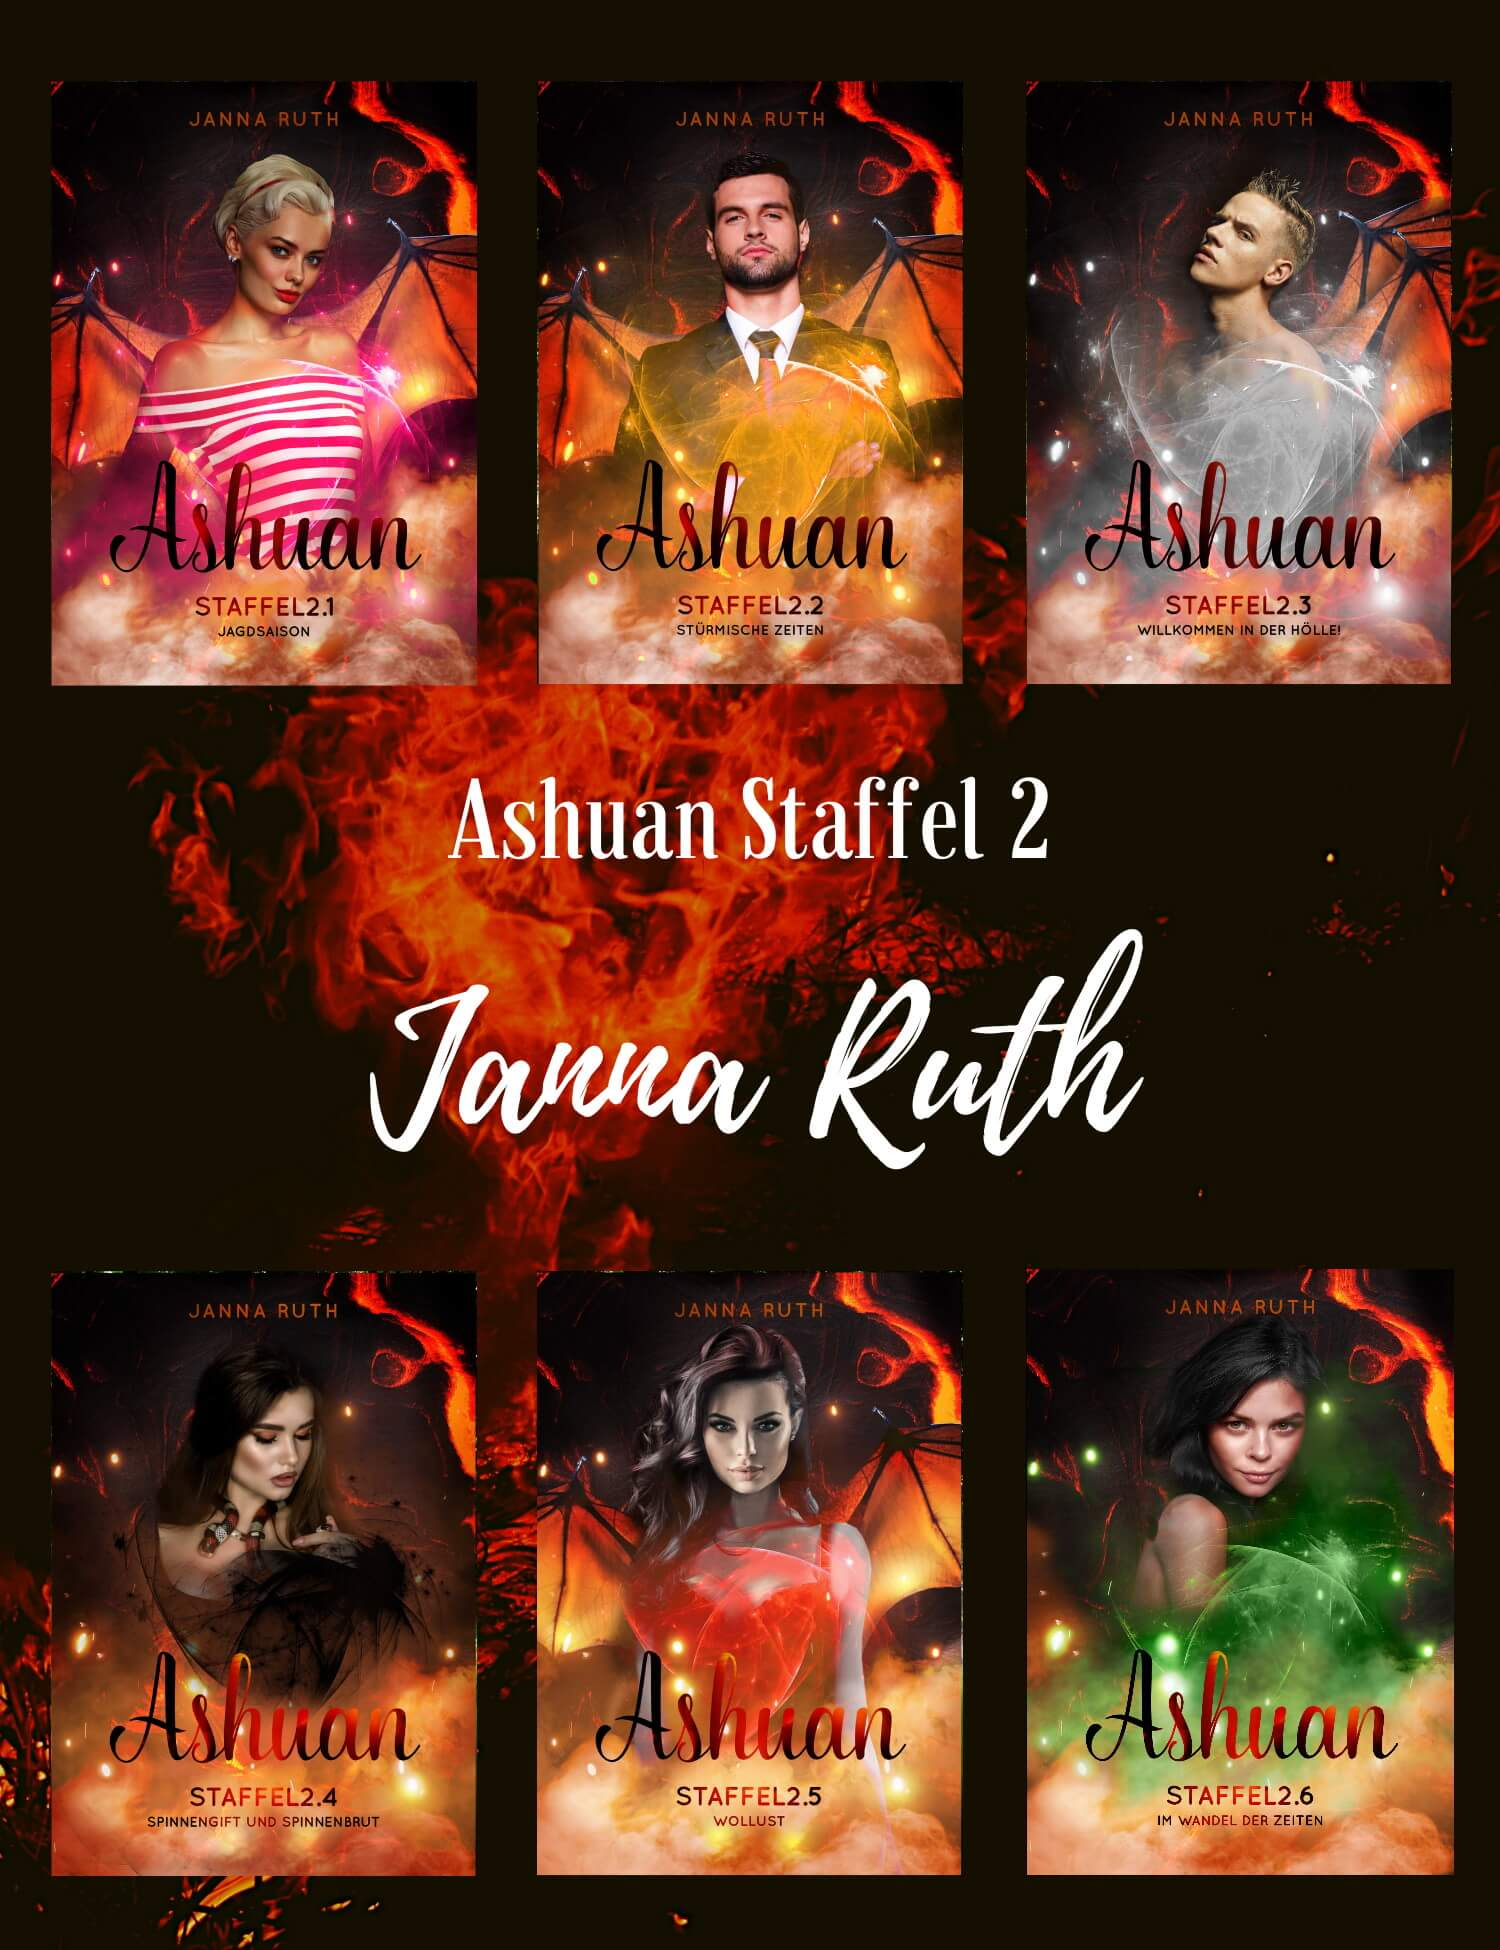 Ashuan Staffel 2